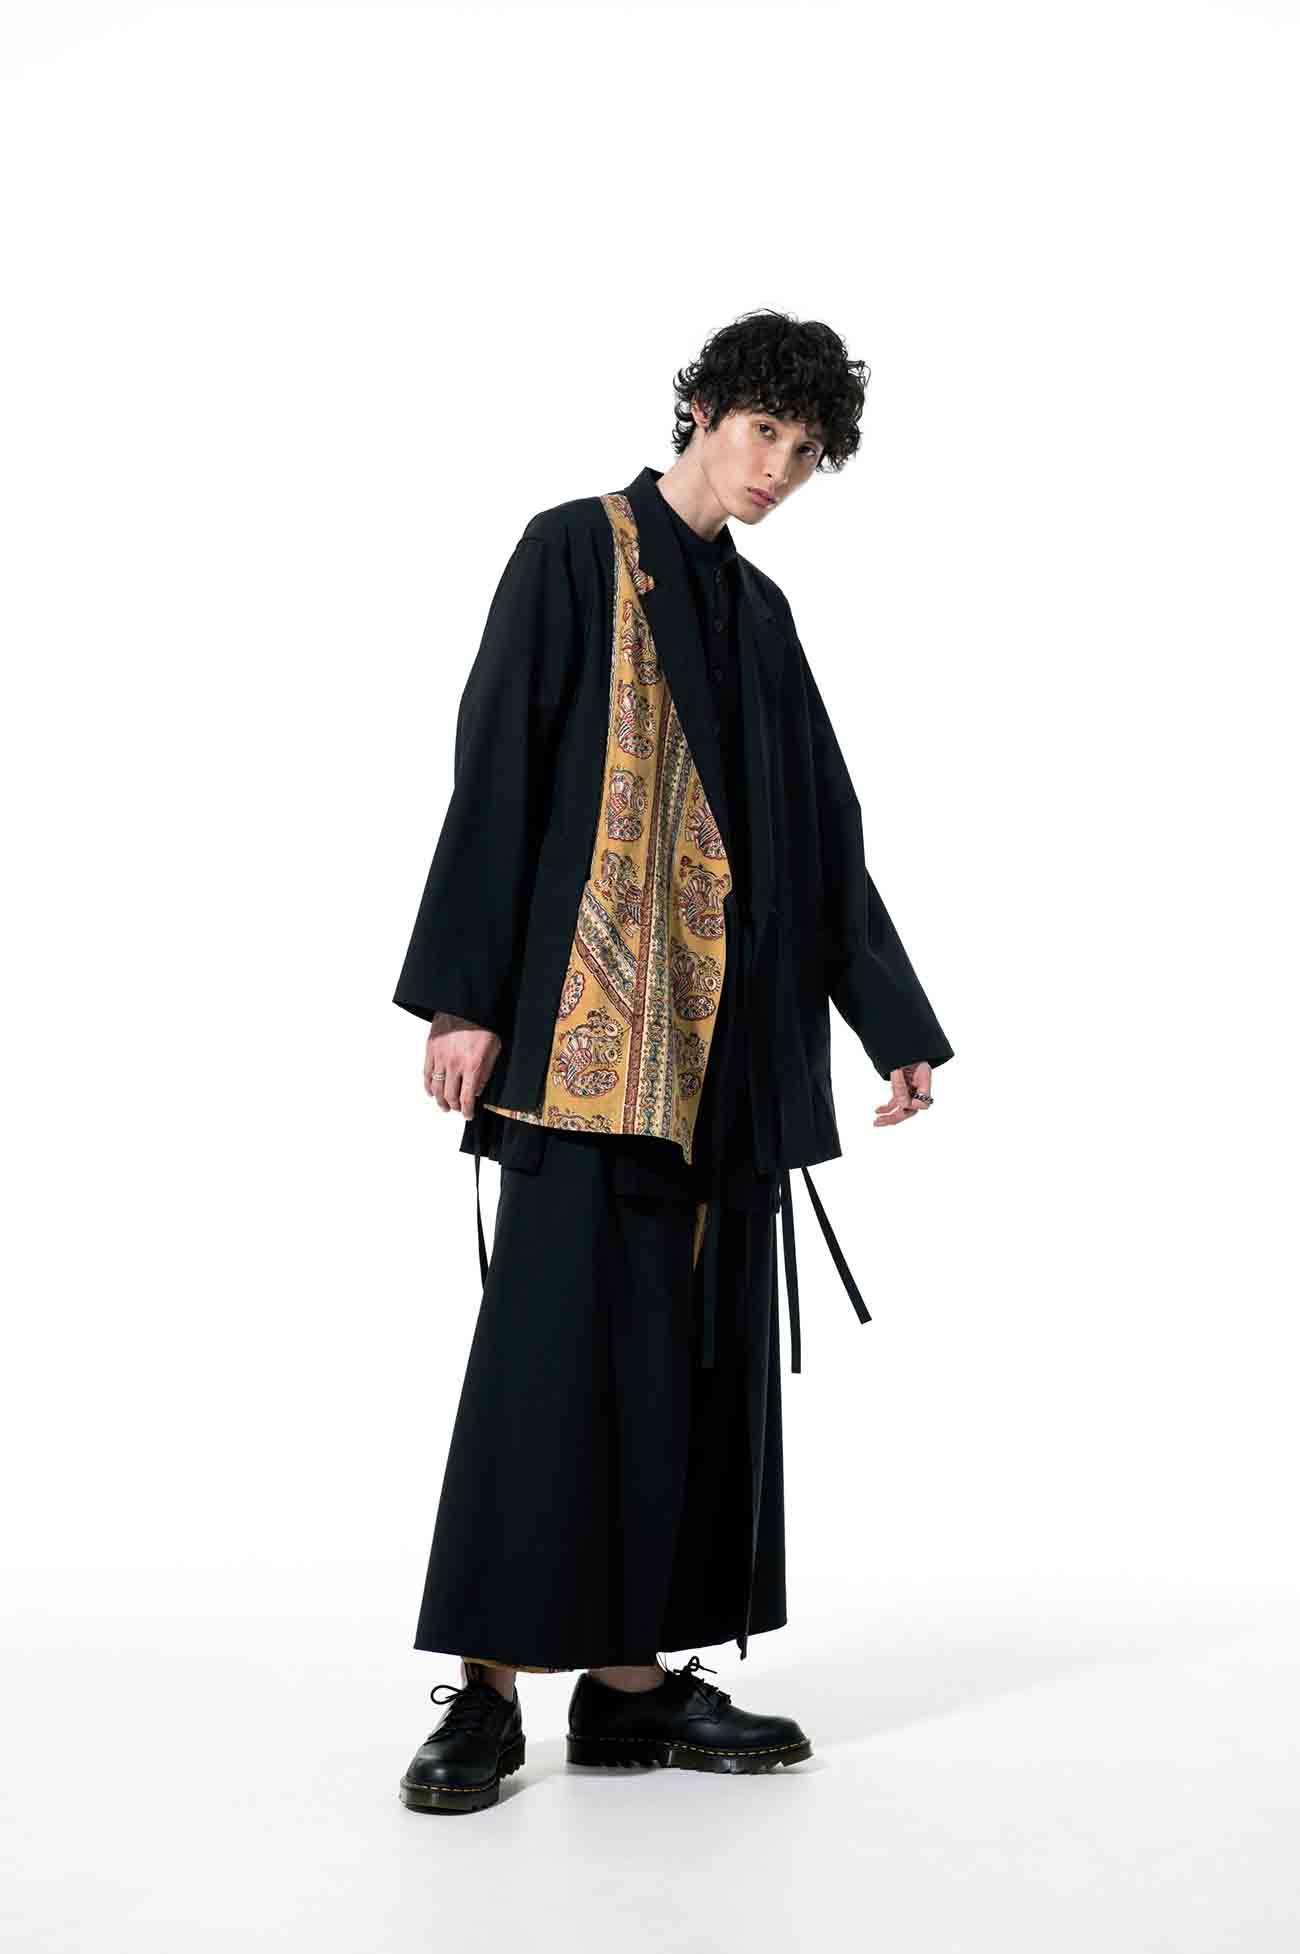 T/W Tropical Indian Block Print Peacock Wrap Haori Tailored Jacket